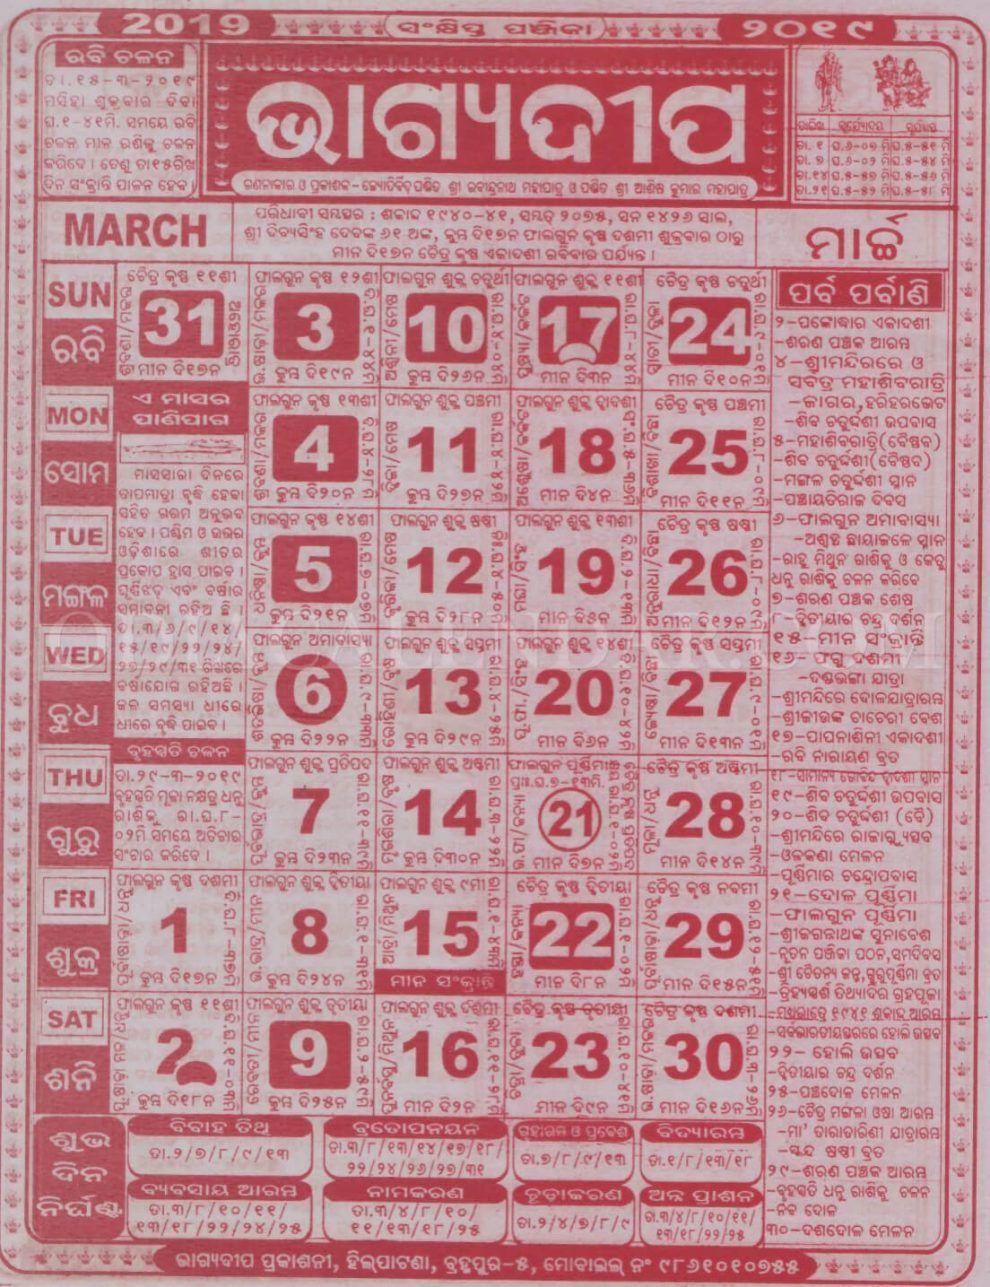 Bhagyadeep Odia Calendar 2019 – Free Odia Panjika (App Book regarding Odia Calendar Bhagyadeep